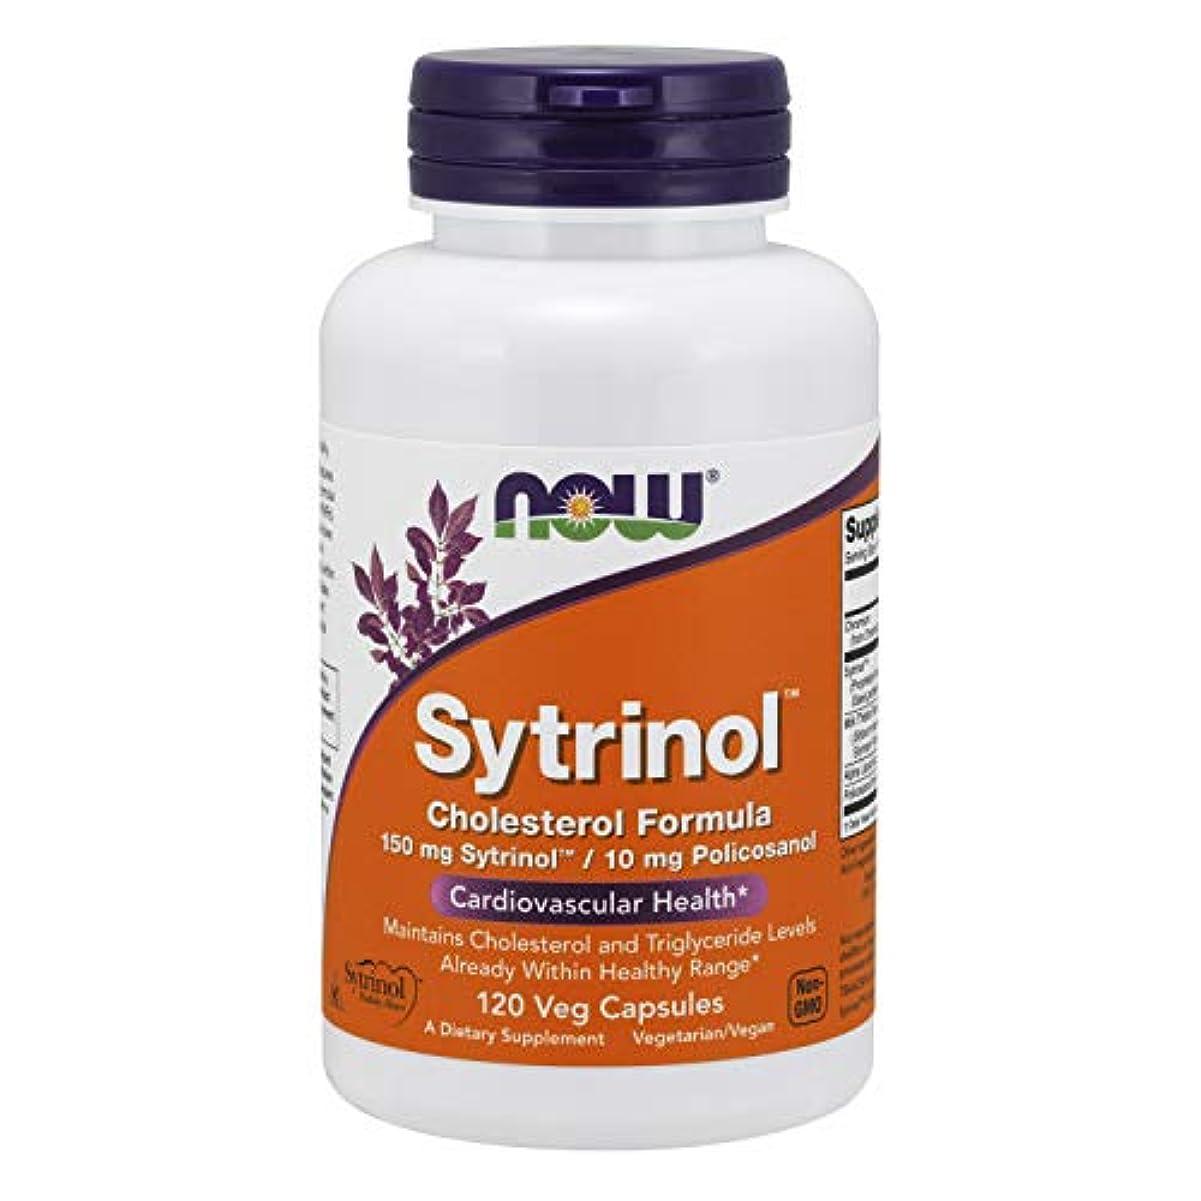 修正爆発物簡単な海外直送品 Now Foods Sytrinol, 120 Vcaps 150 mg